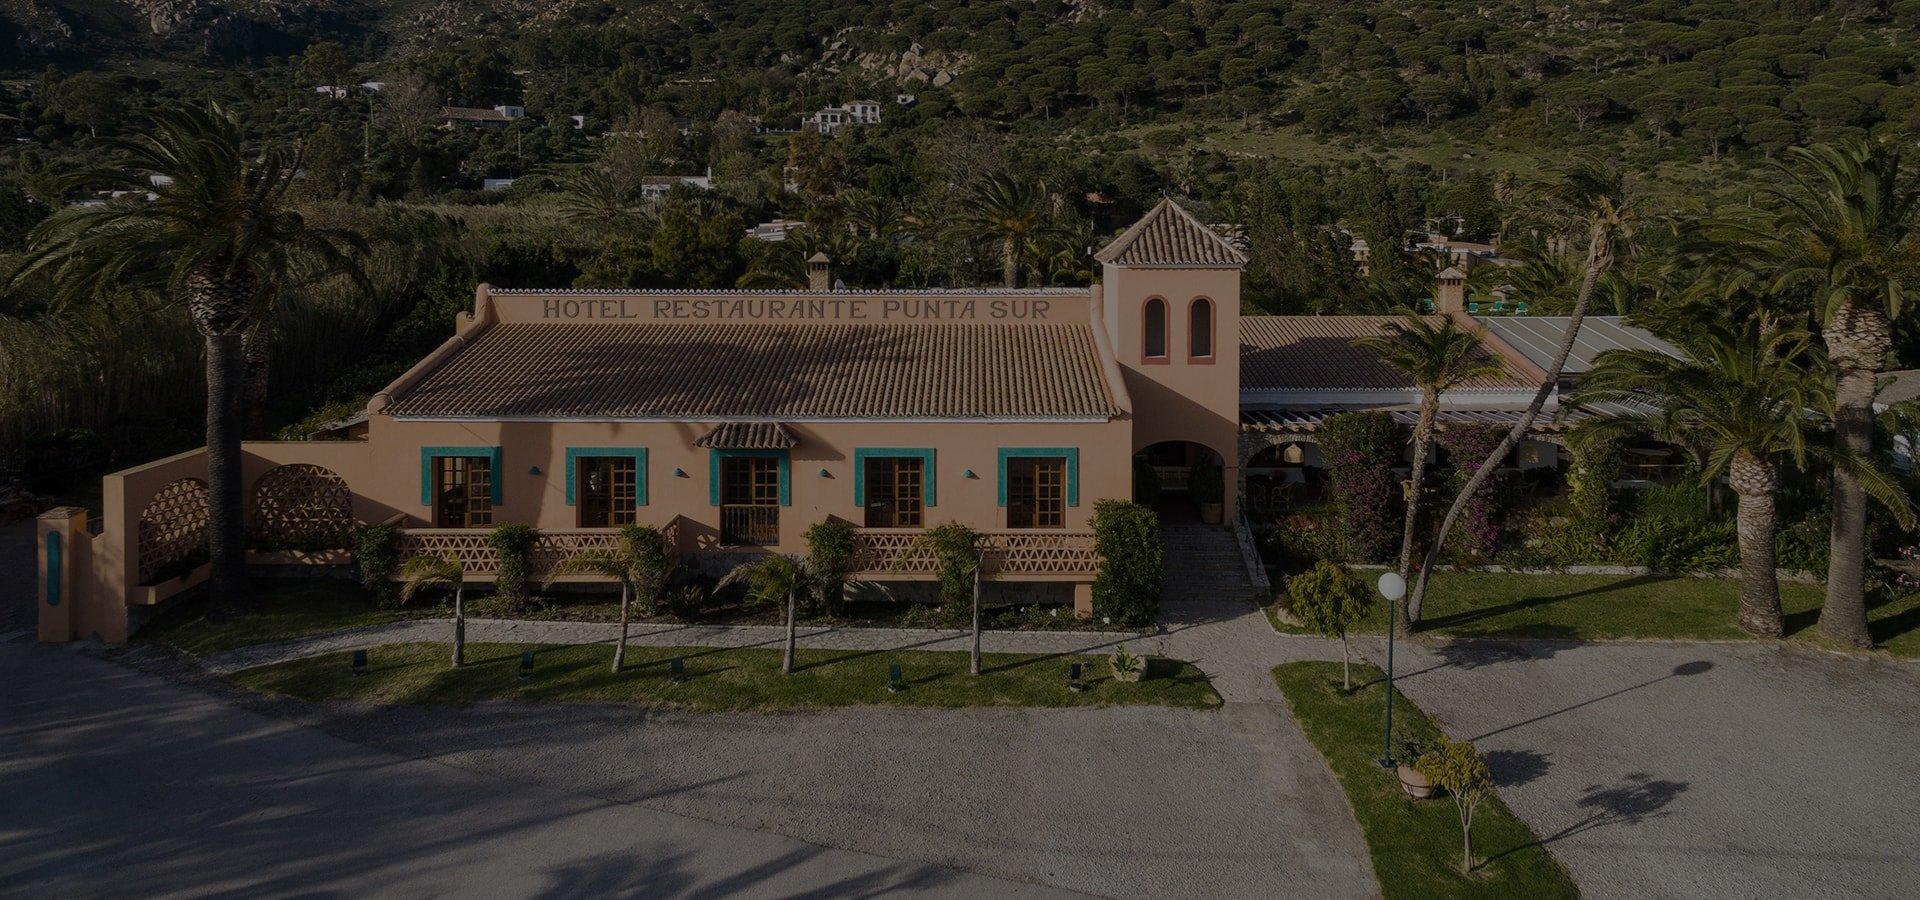 Hotel Punta Sur en Tarifa